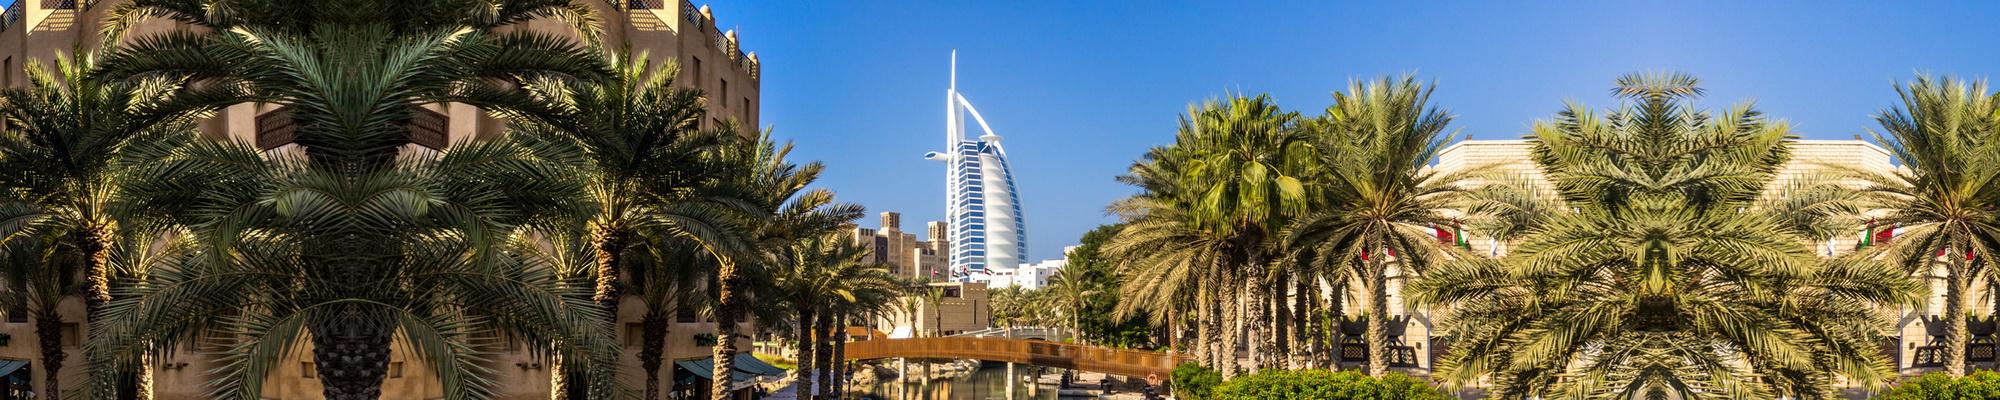 2018-07_Dubai_Banner